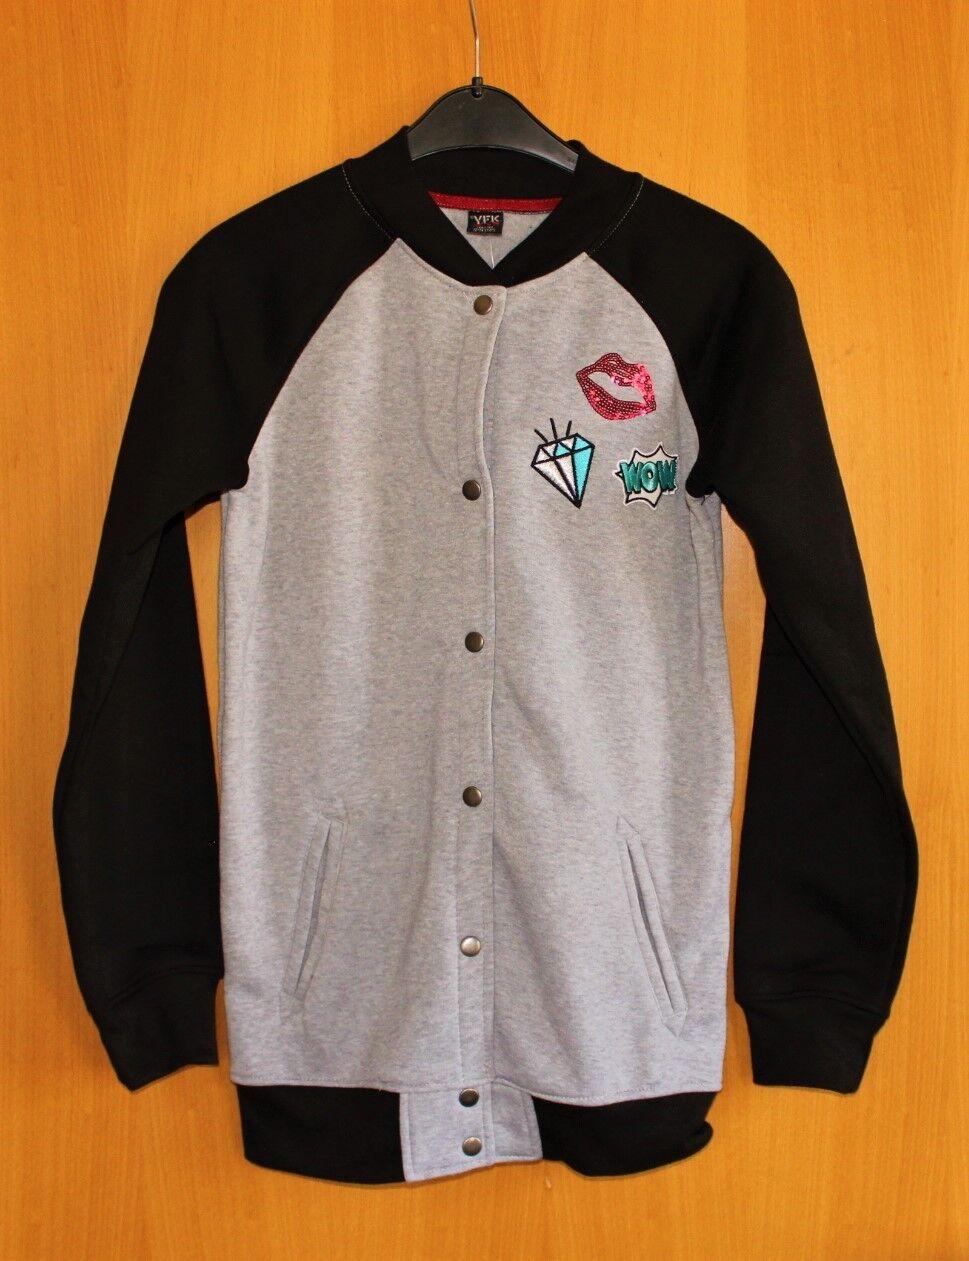 Mädchen Collegejacke Jacke Sweatjacke Baseballjacke schwarz grau WOW 158 164 NEU